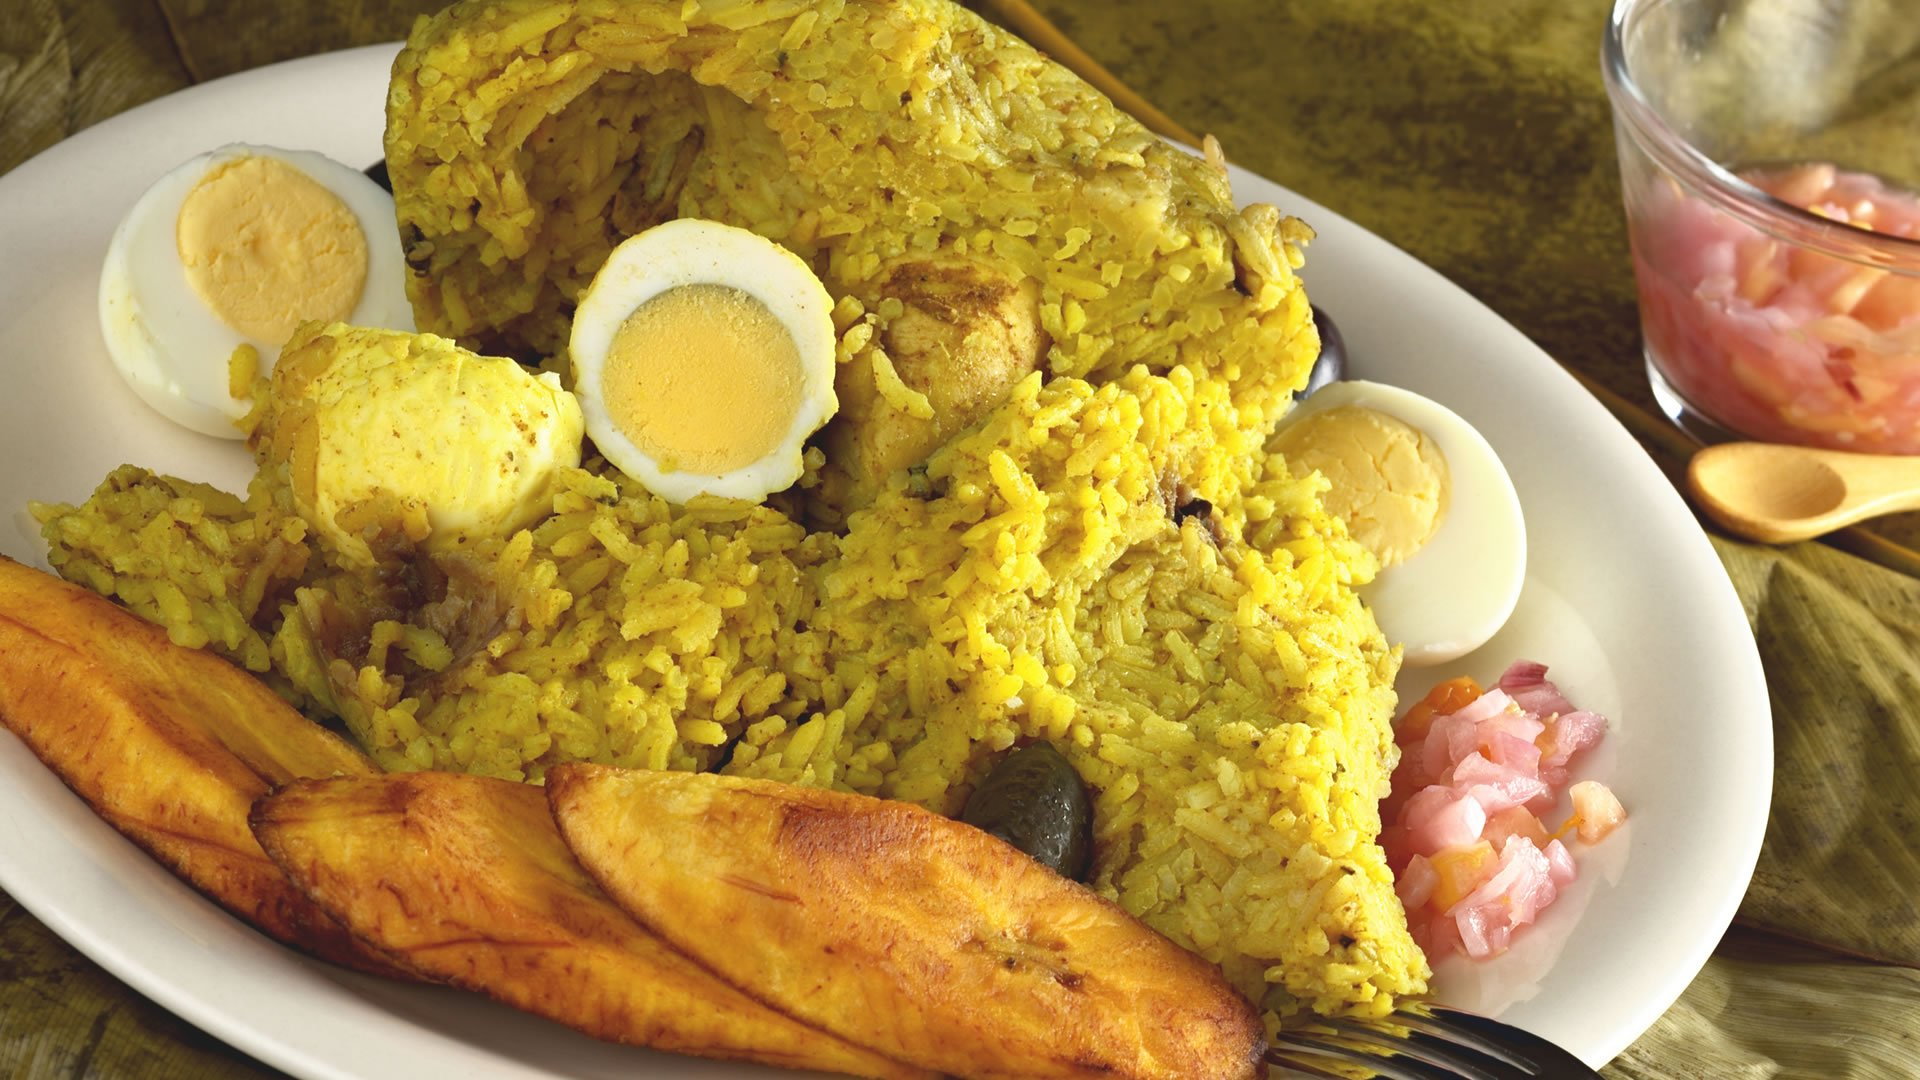 Gastronomía de la Amazonia peruana